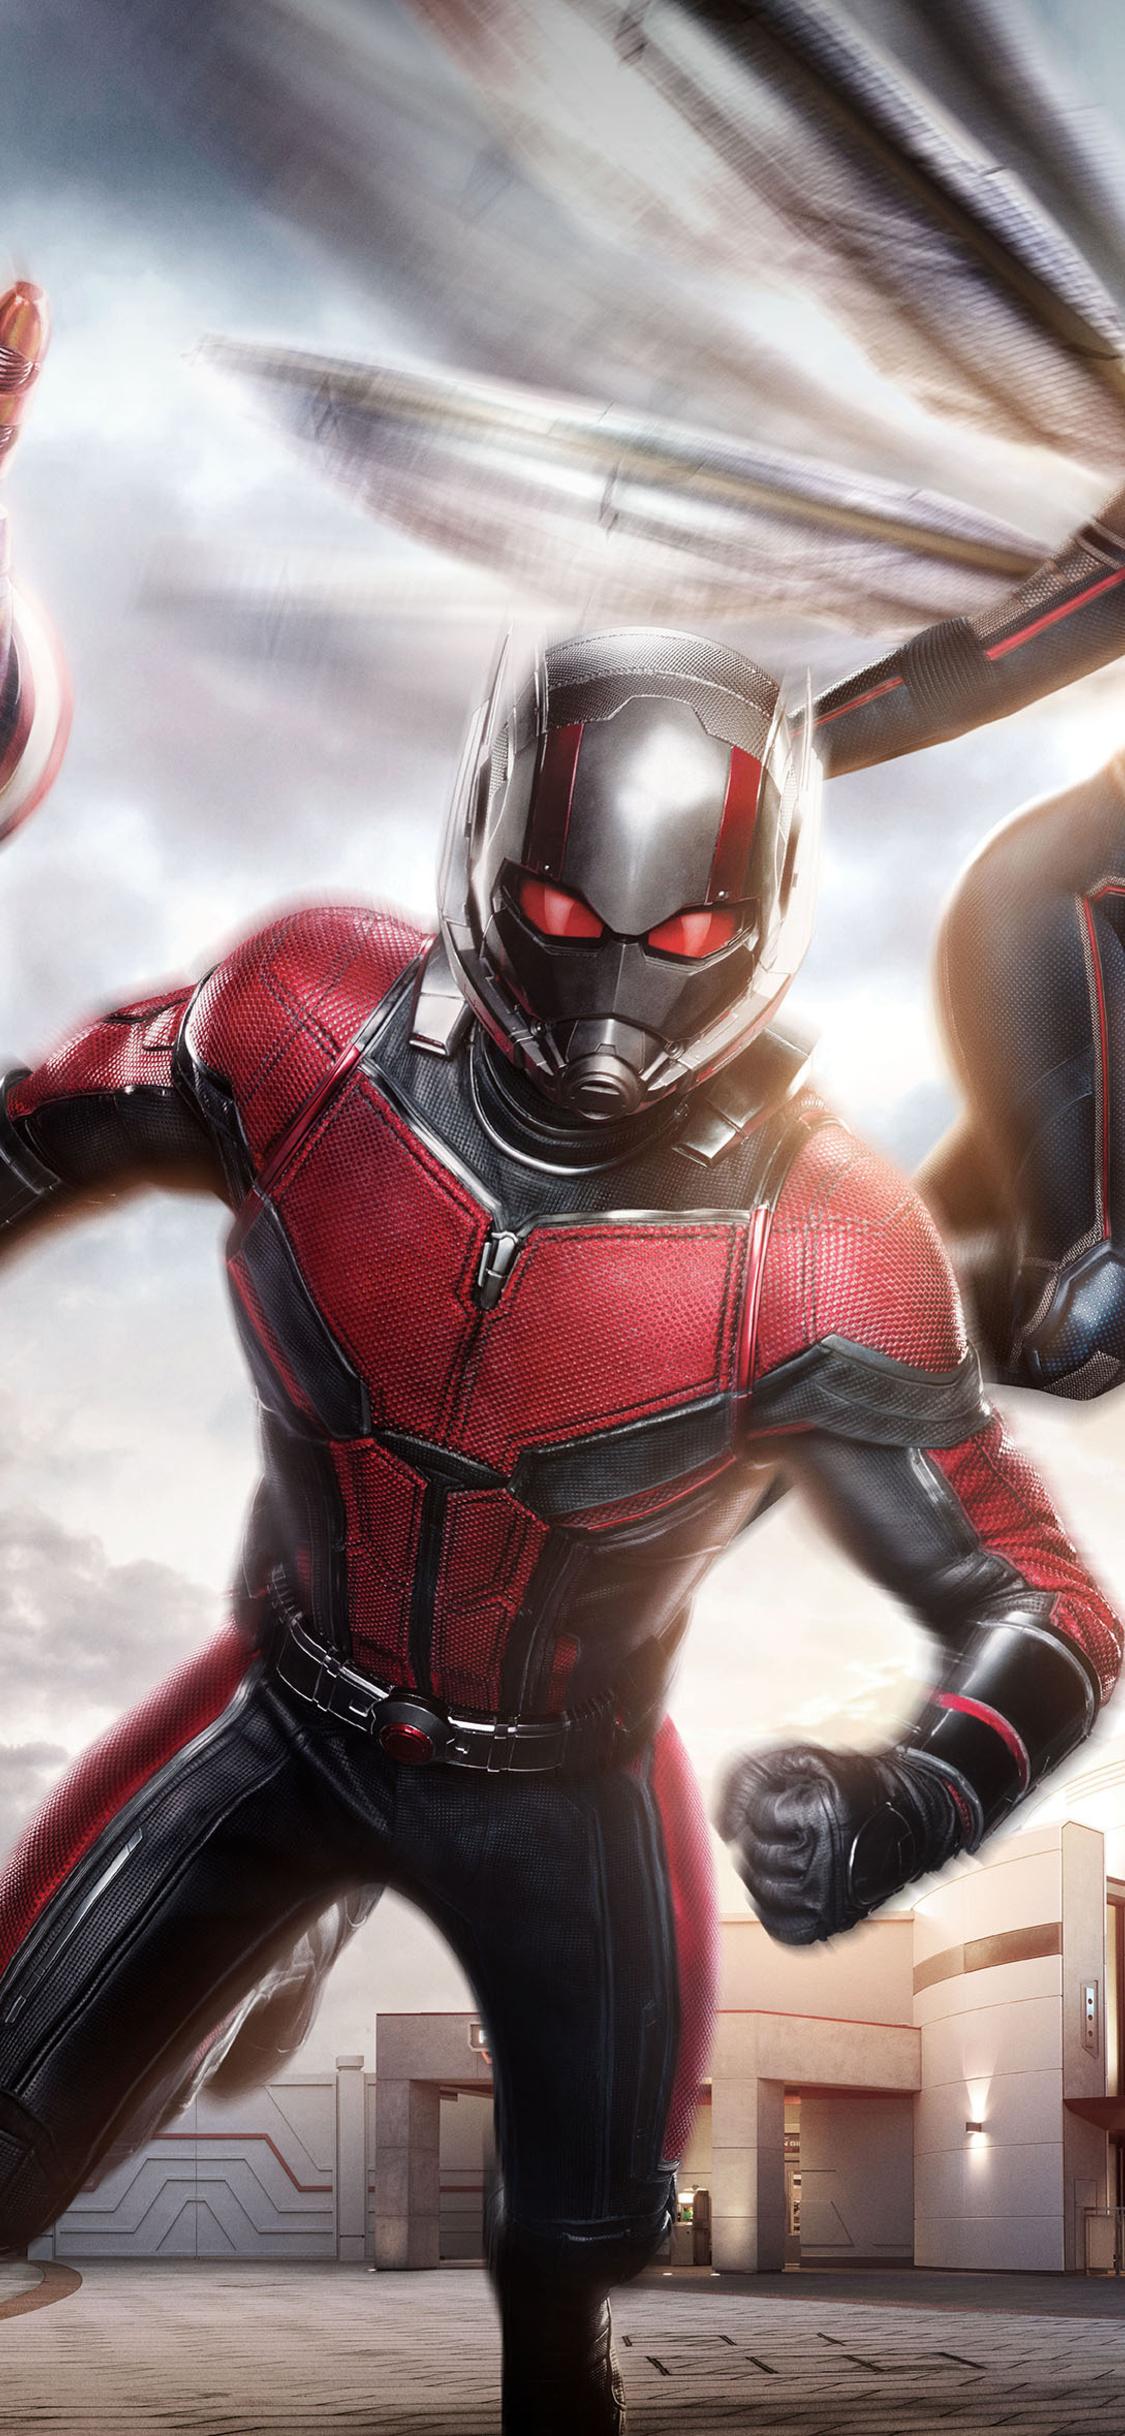 iron-man-ant-man-wasp-4k-s0.jpg